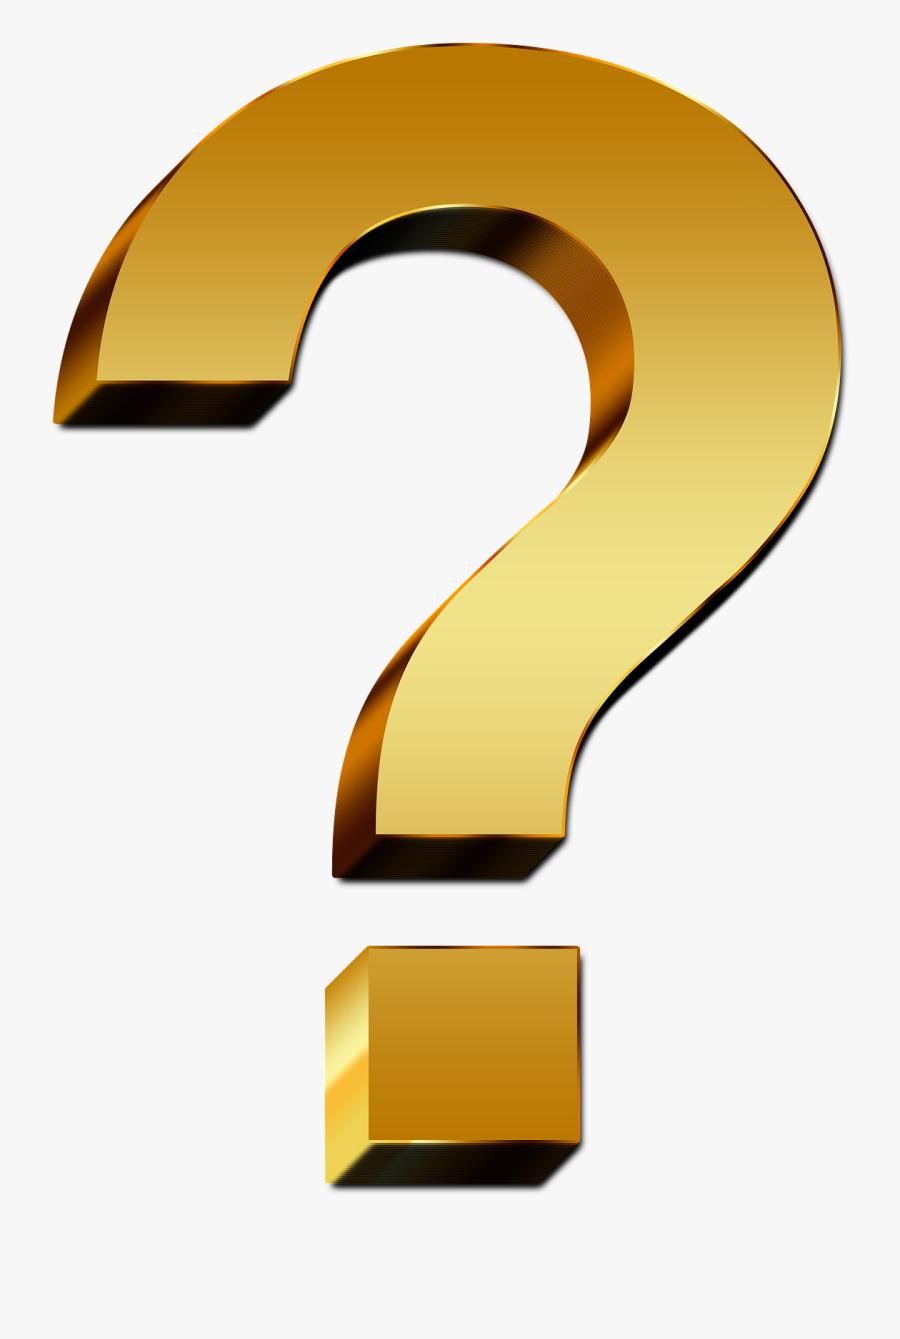 Living Clipart Question Mark - Golden Question Mark Png, Transparent Clipart